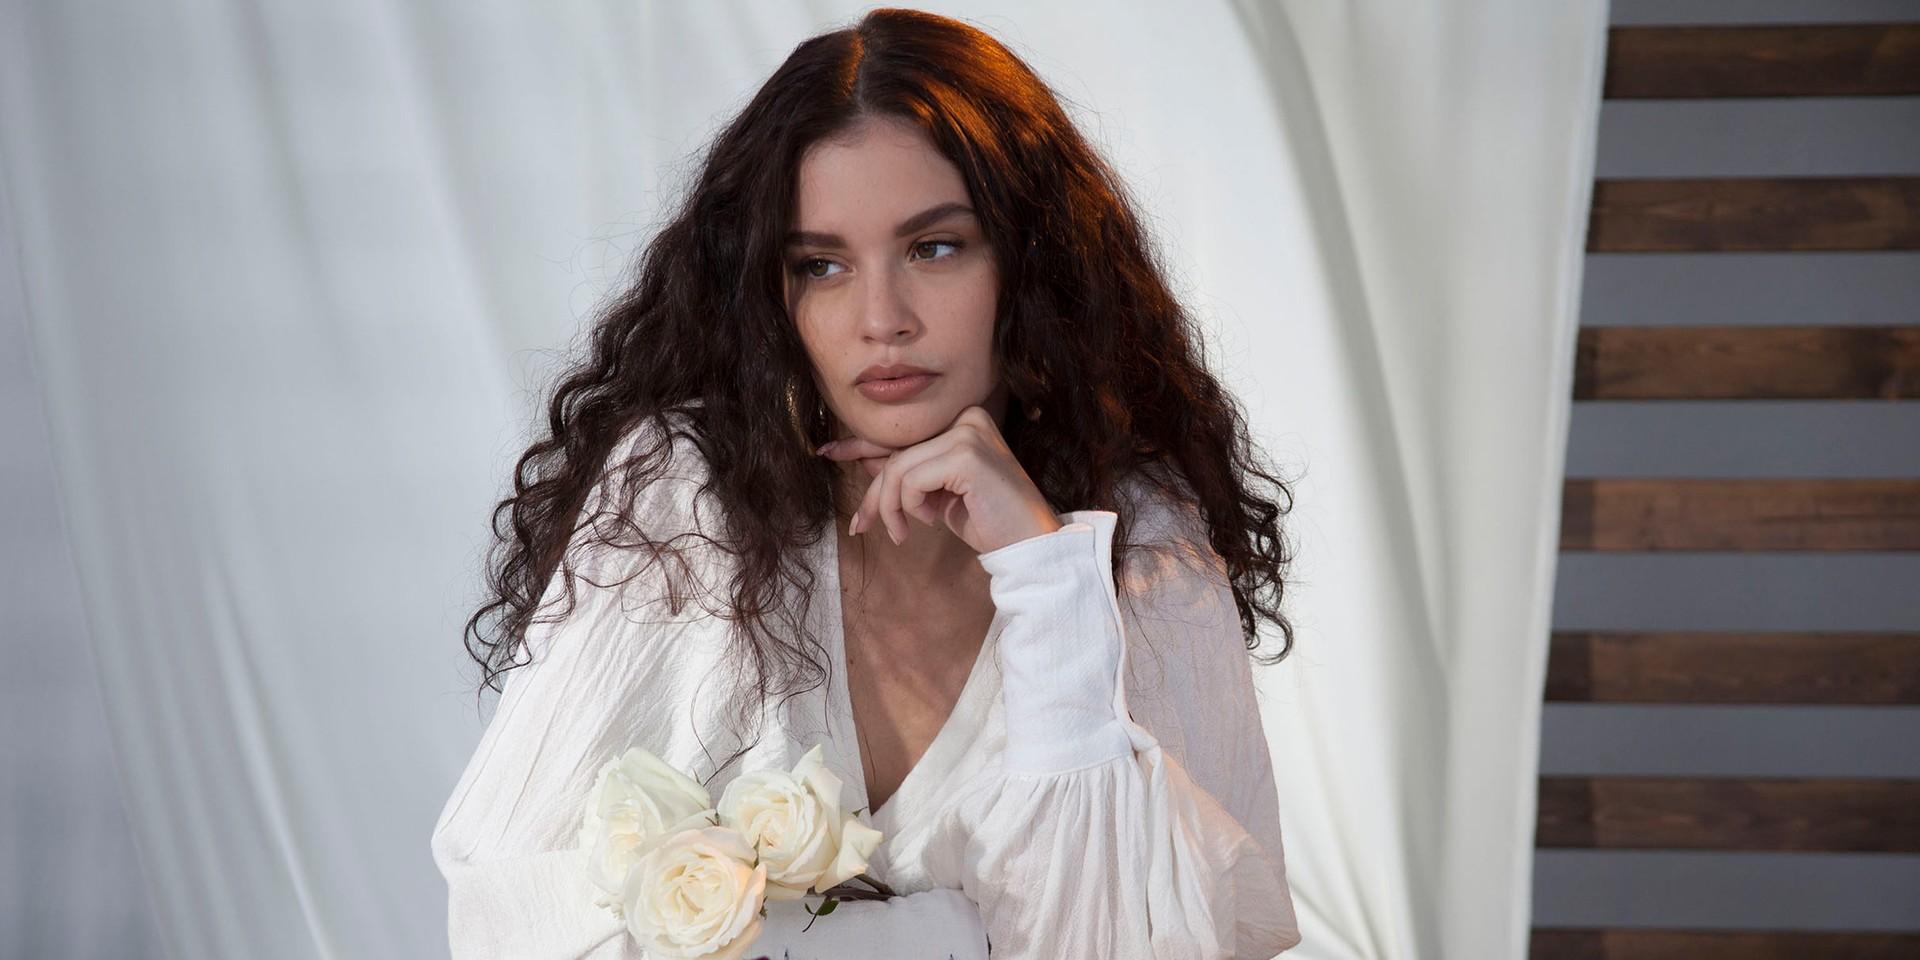 Sabrina Claudio will no longer perform at Garden Beats this month